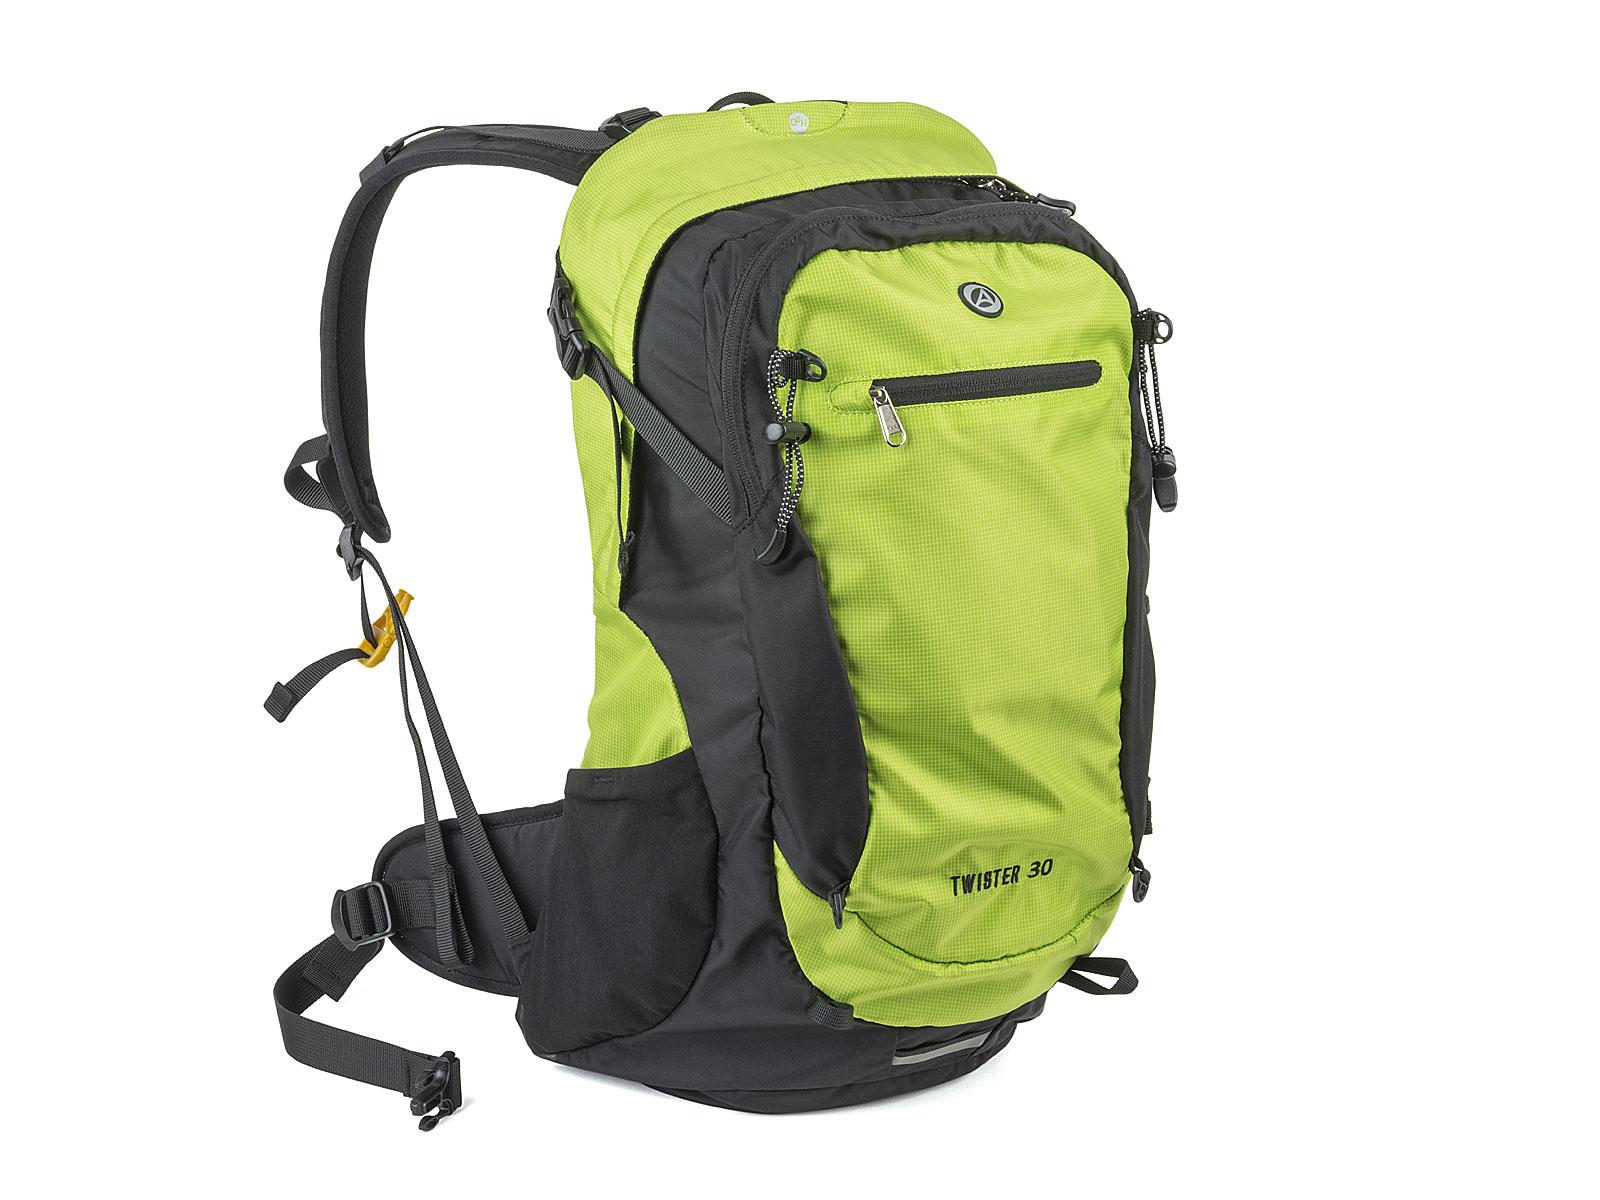 17ae653db46 Batoh A-B Twister X7 (černá zelená) (UA 08100056) - UNIAG.biz ...